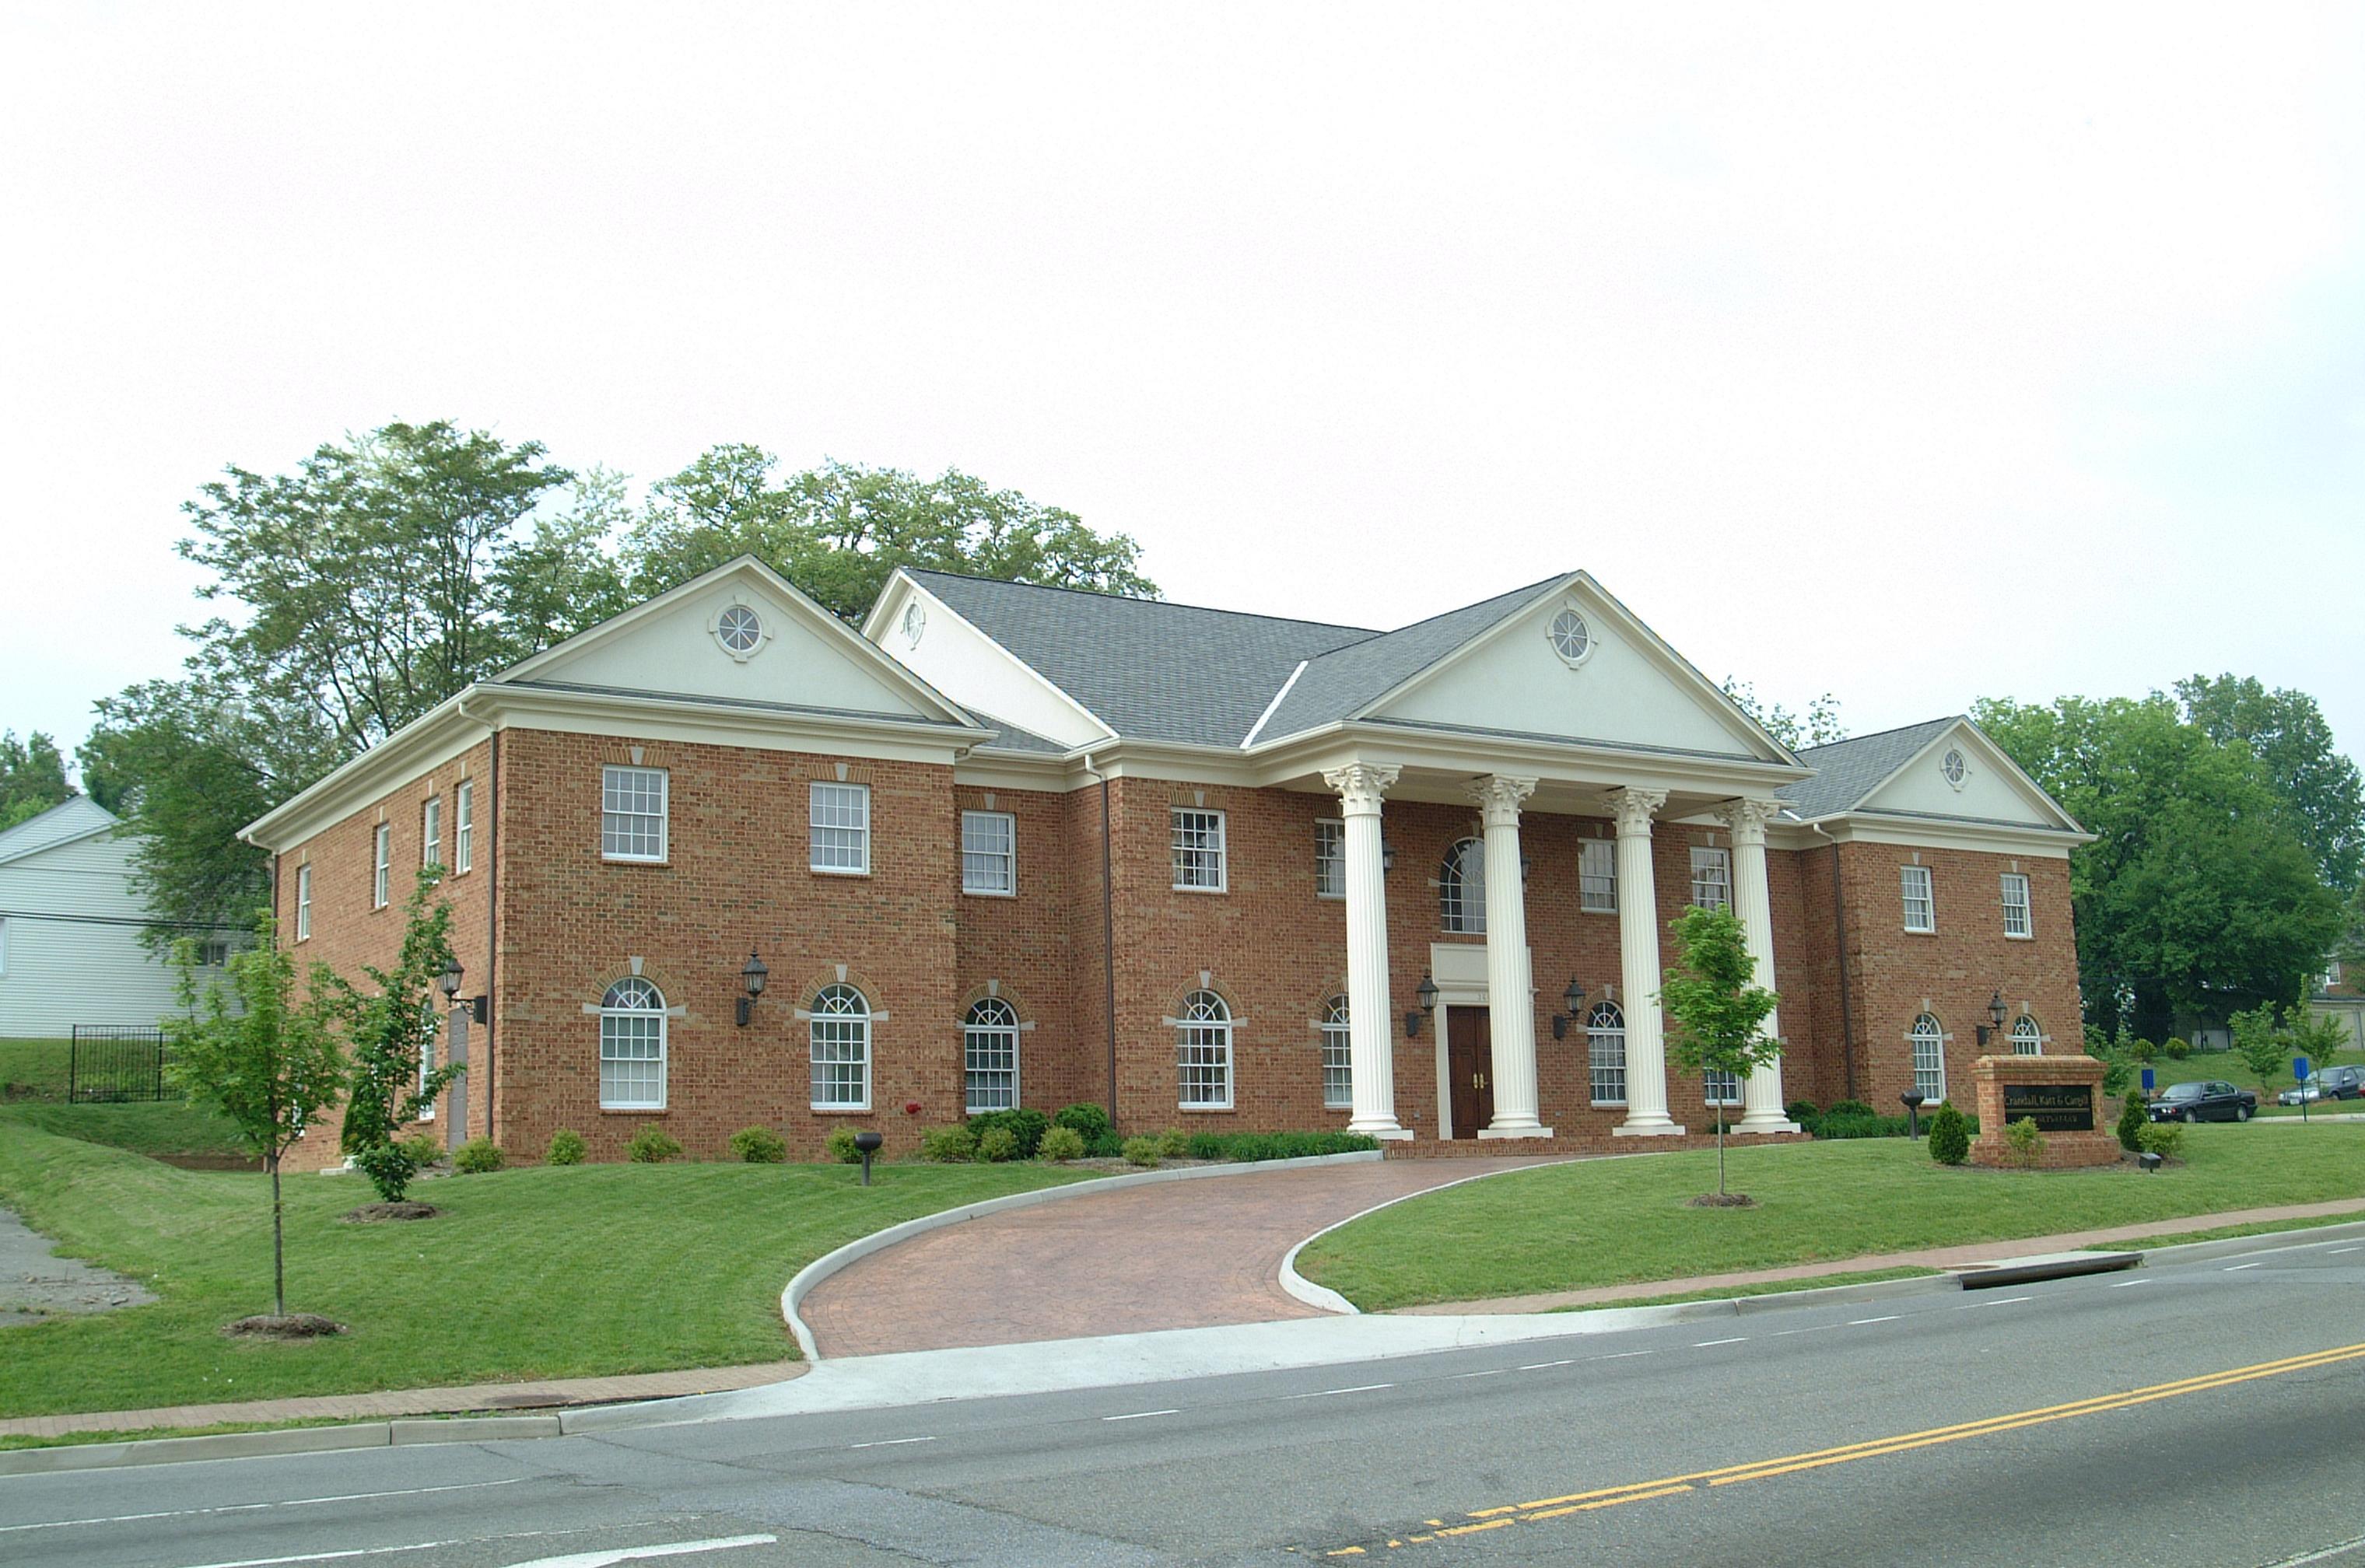 The Law Offices of Daniel L. Crandall & Associates image 3